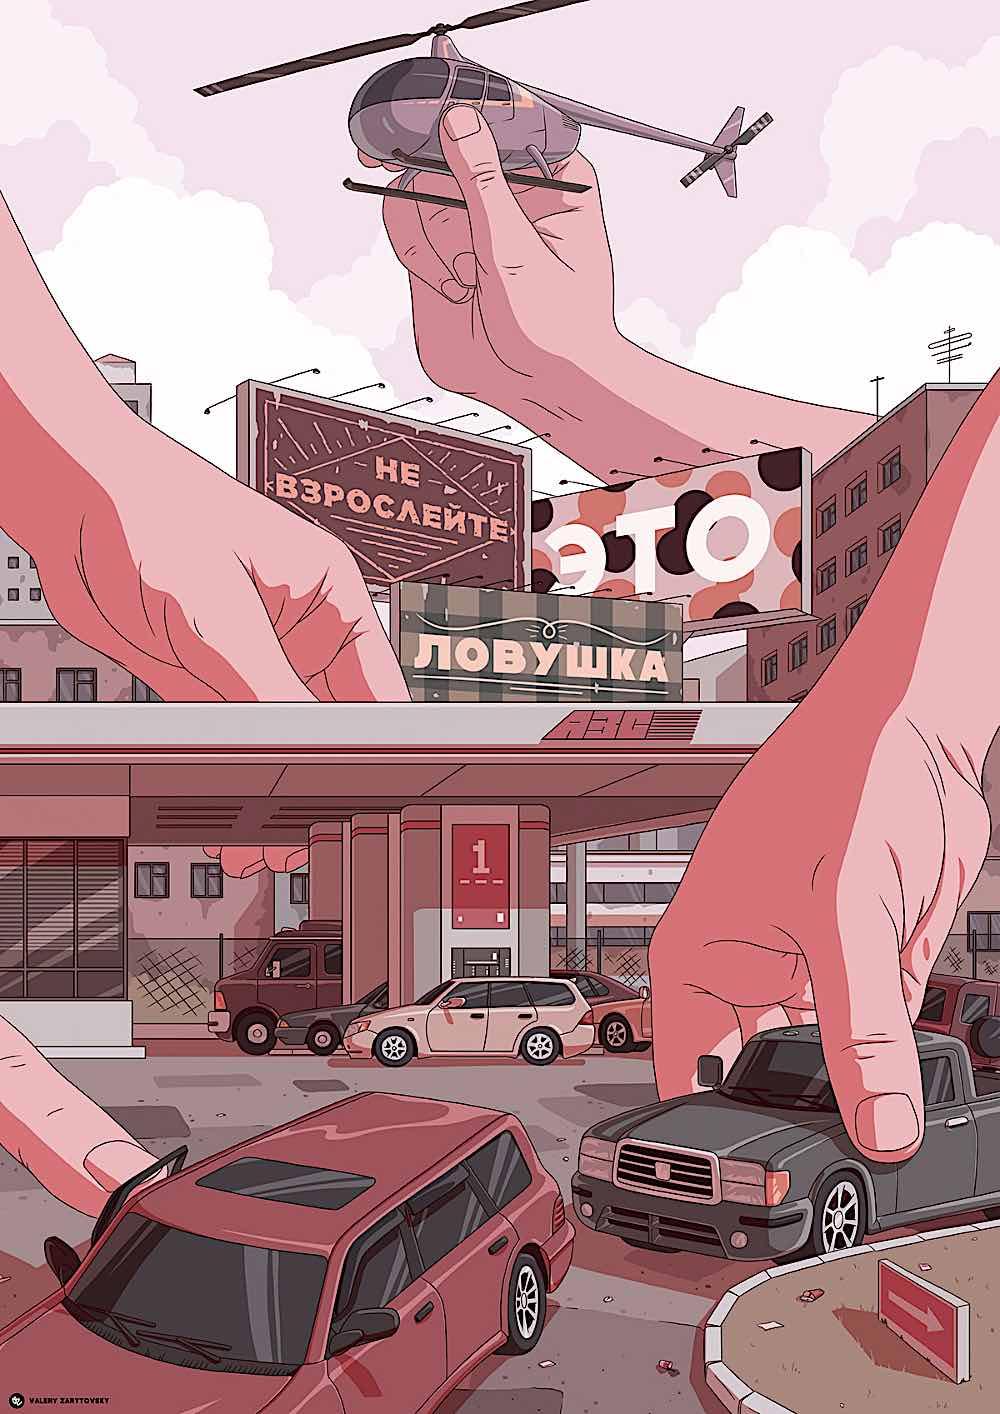 Valeri Zarytovski art, giants hands in a city